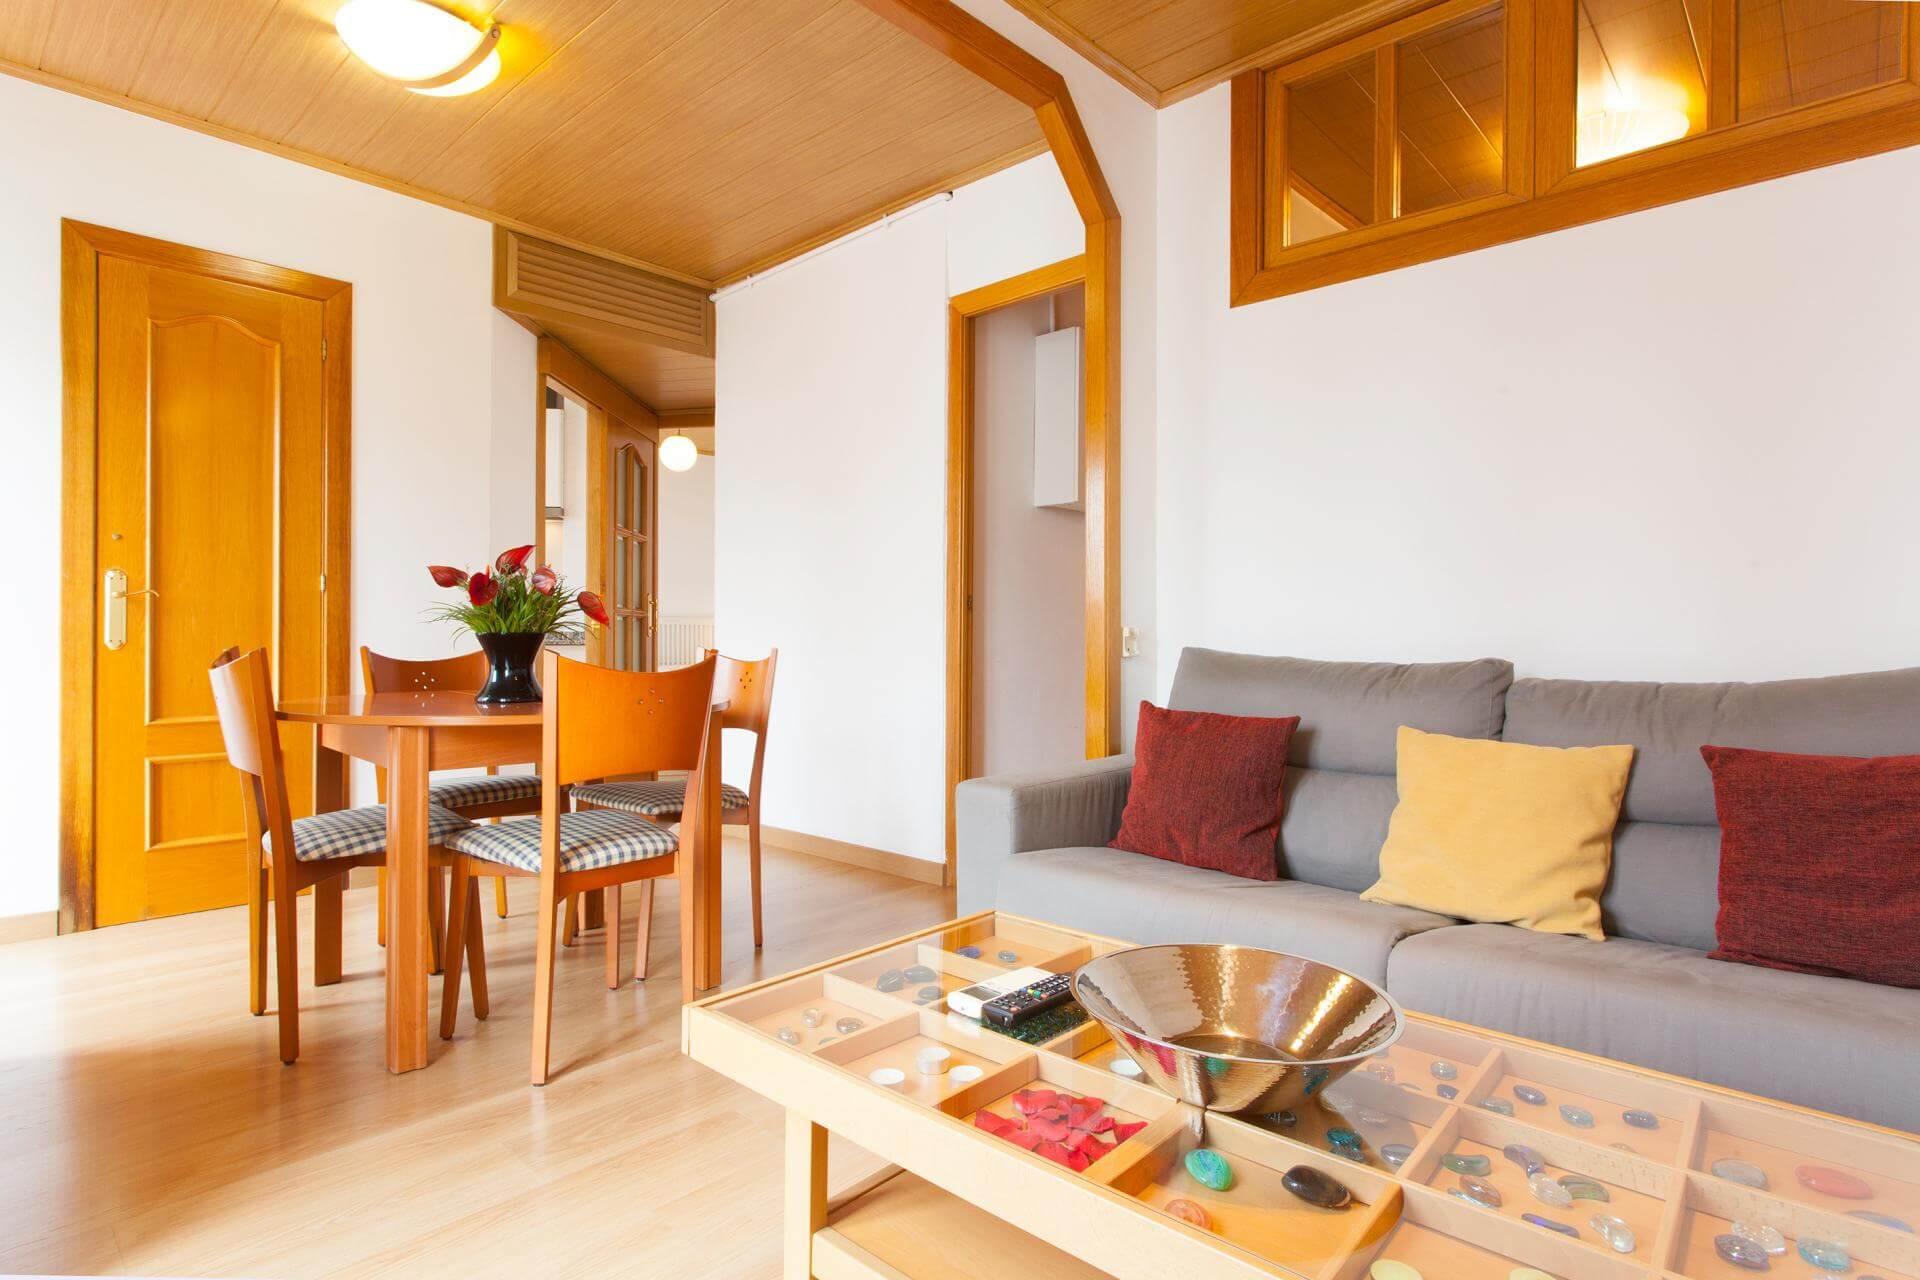 ShBarcelona - Monthly rental two bedroom flat Sants Montjuïc